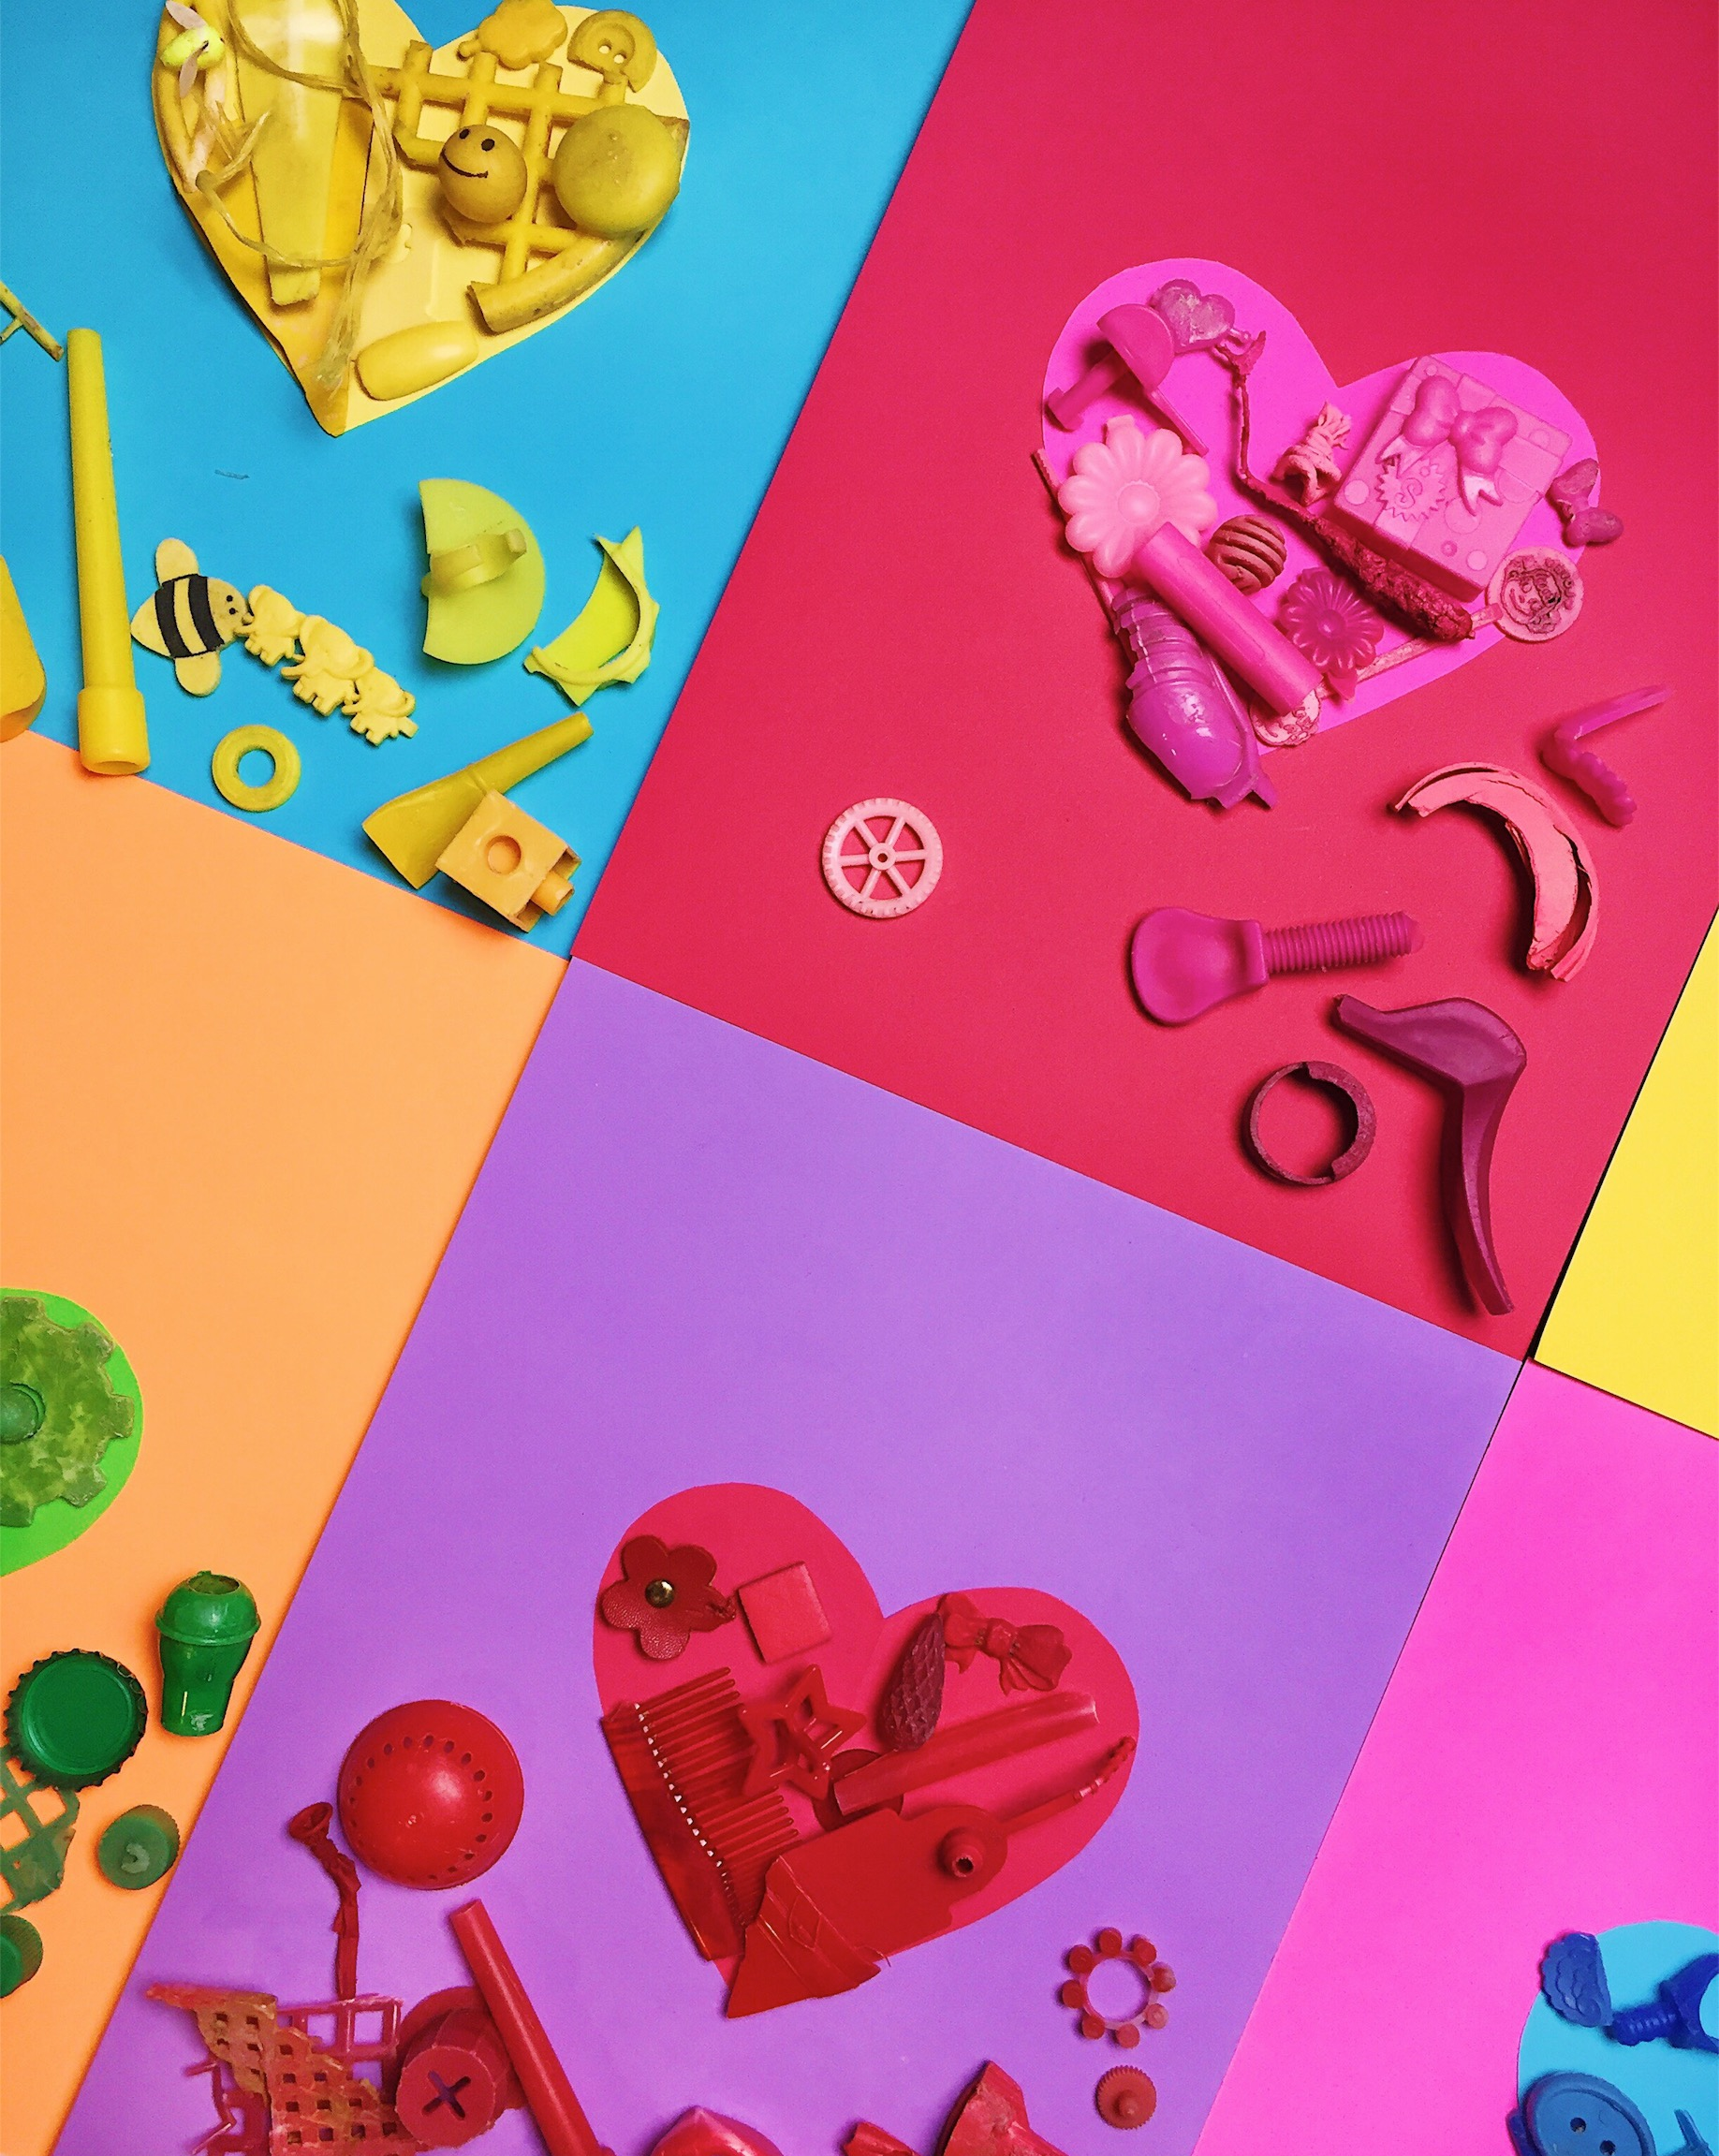 amy_chen_design_beach_plastic_valentine_process_2.jpeg